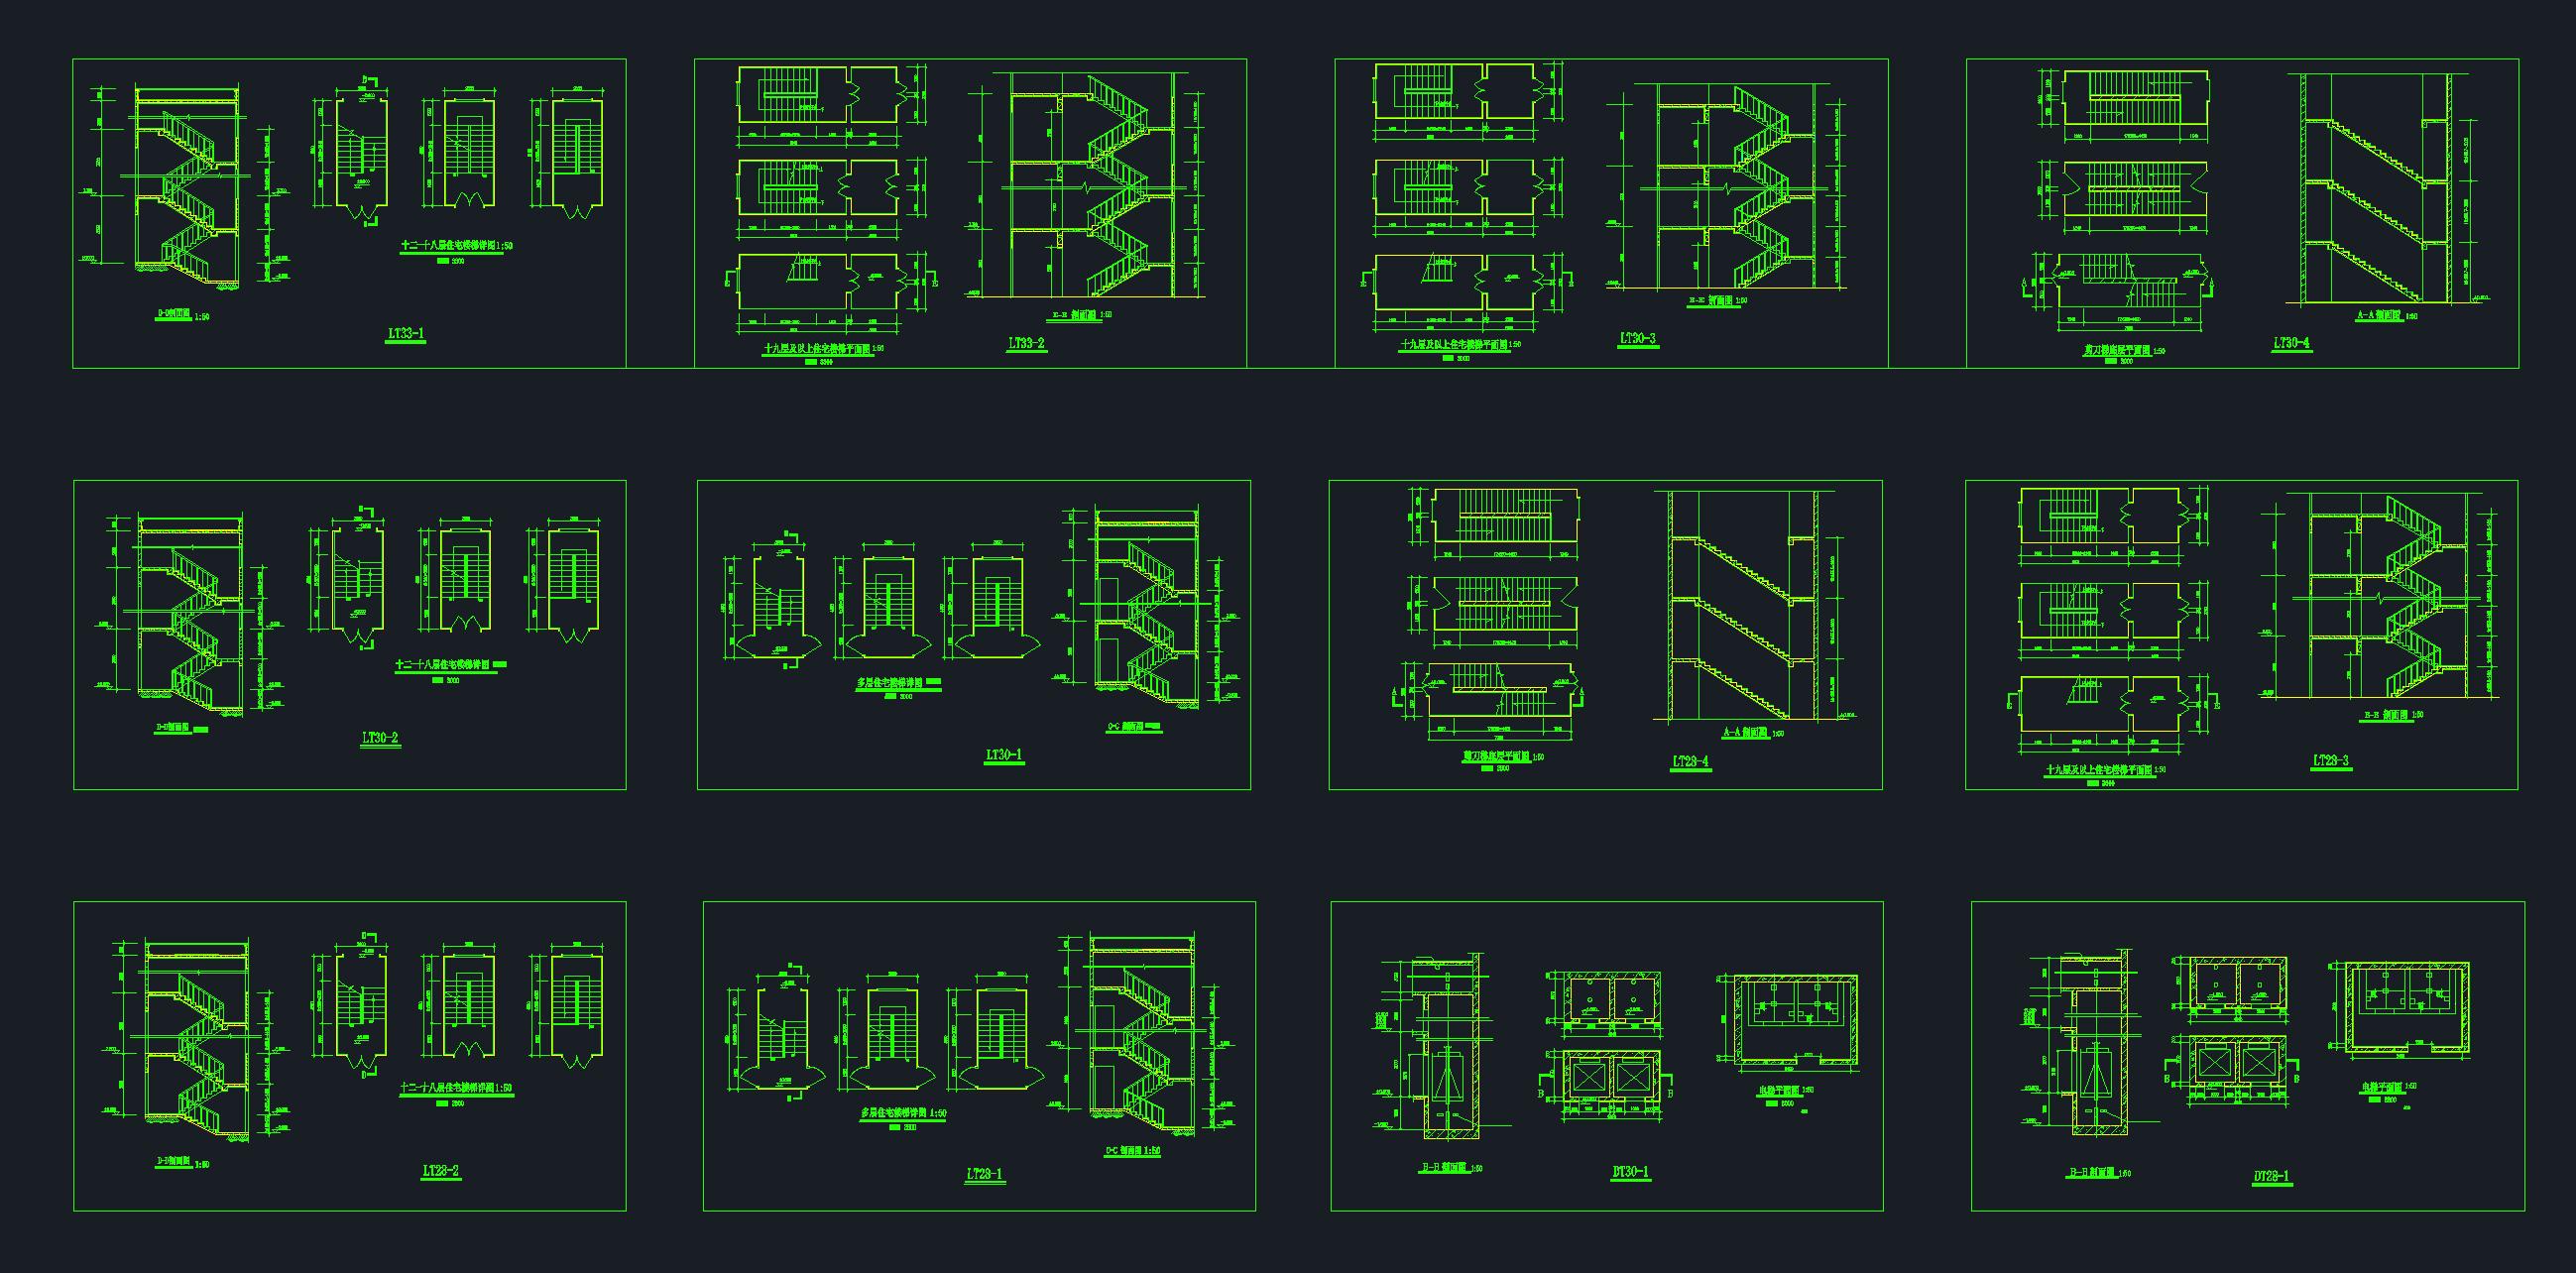 CAD楼梯图库全集图纸免费下载